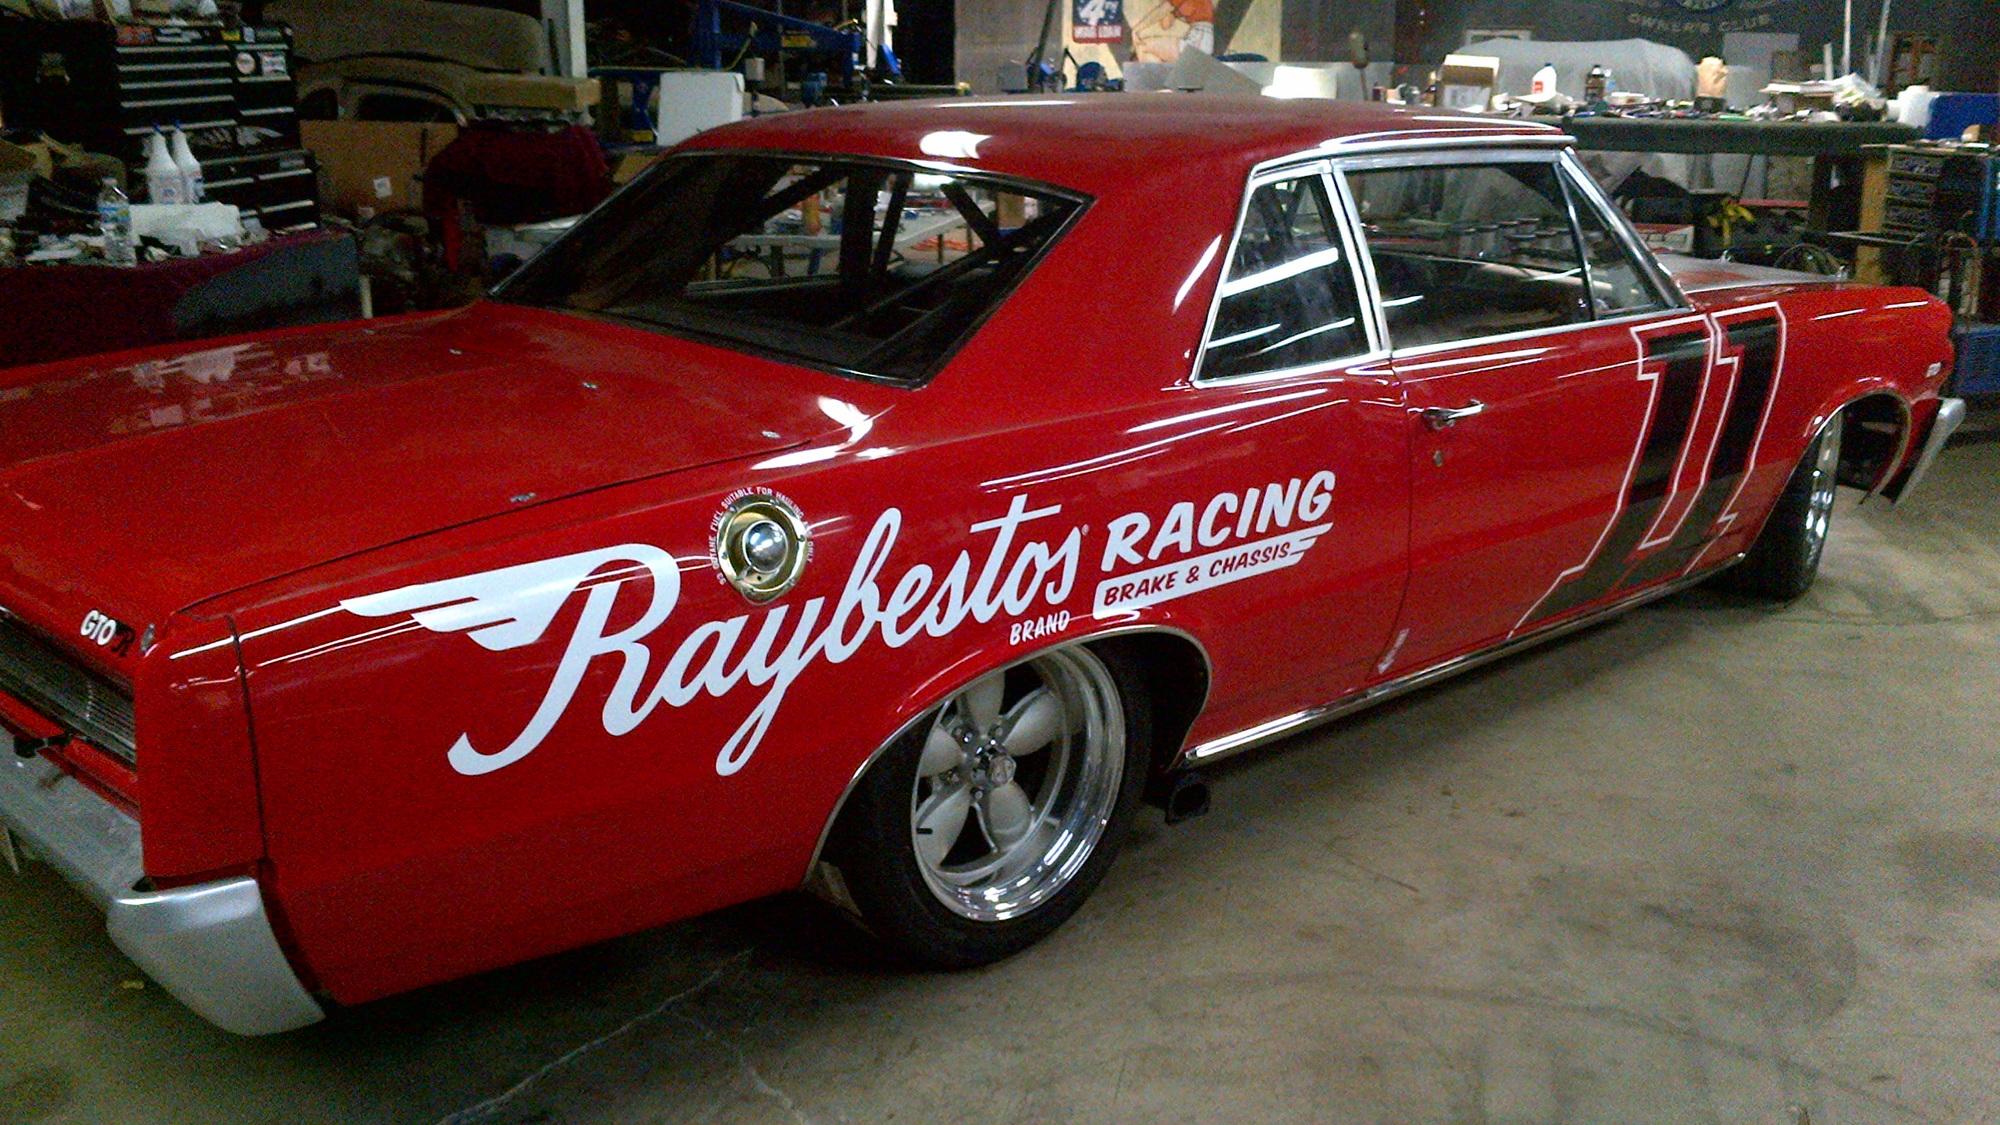 Raybestos 1964 Pontiac GTO-R. Image courtesy of Raybestos.